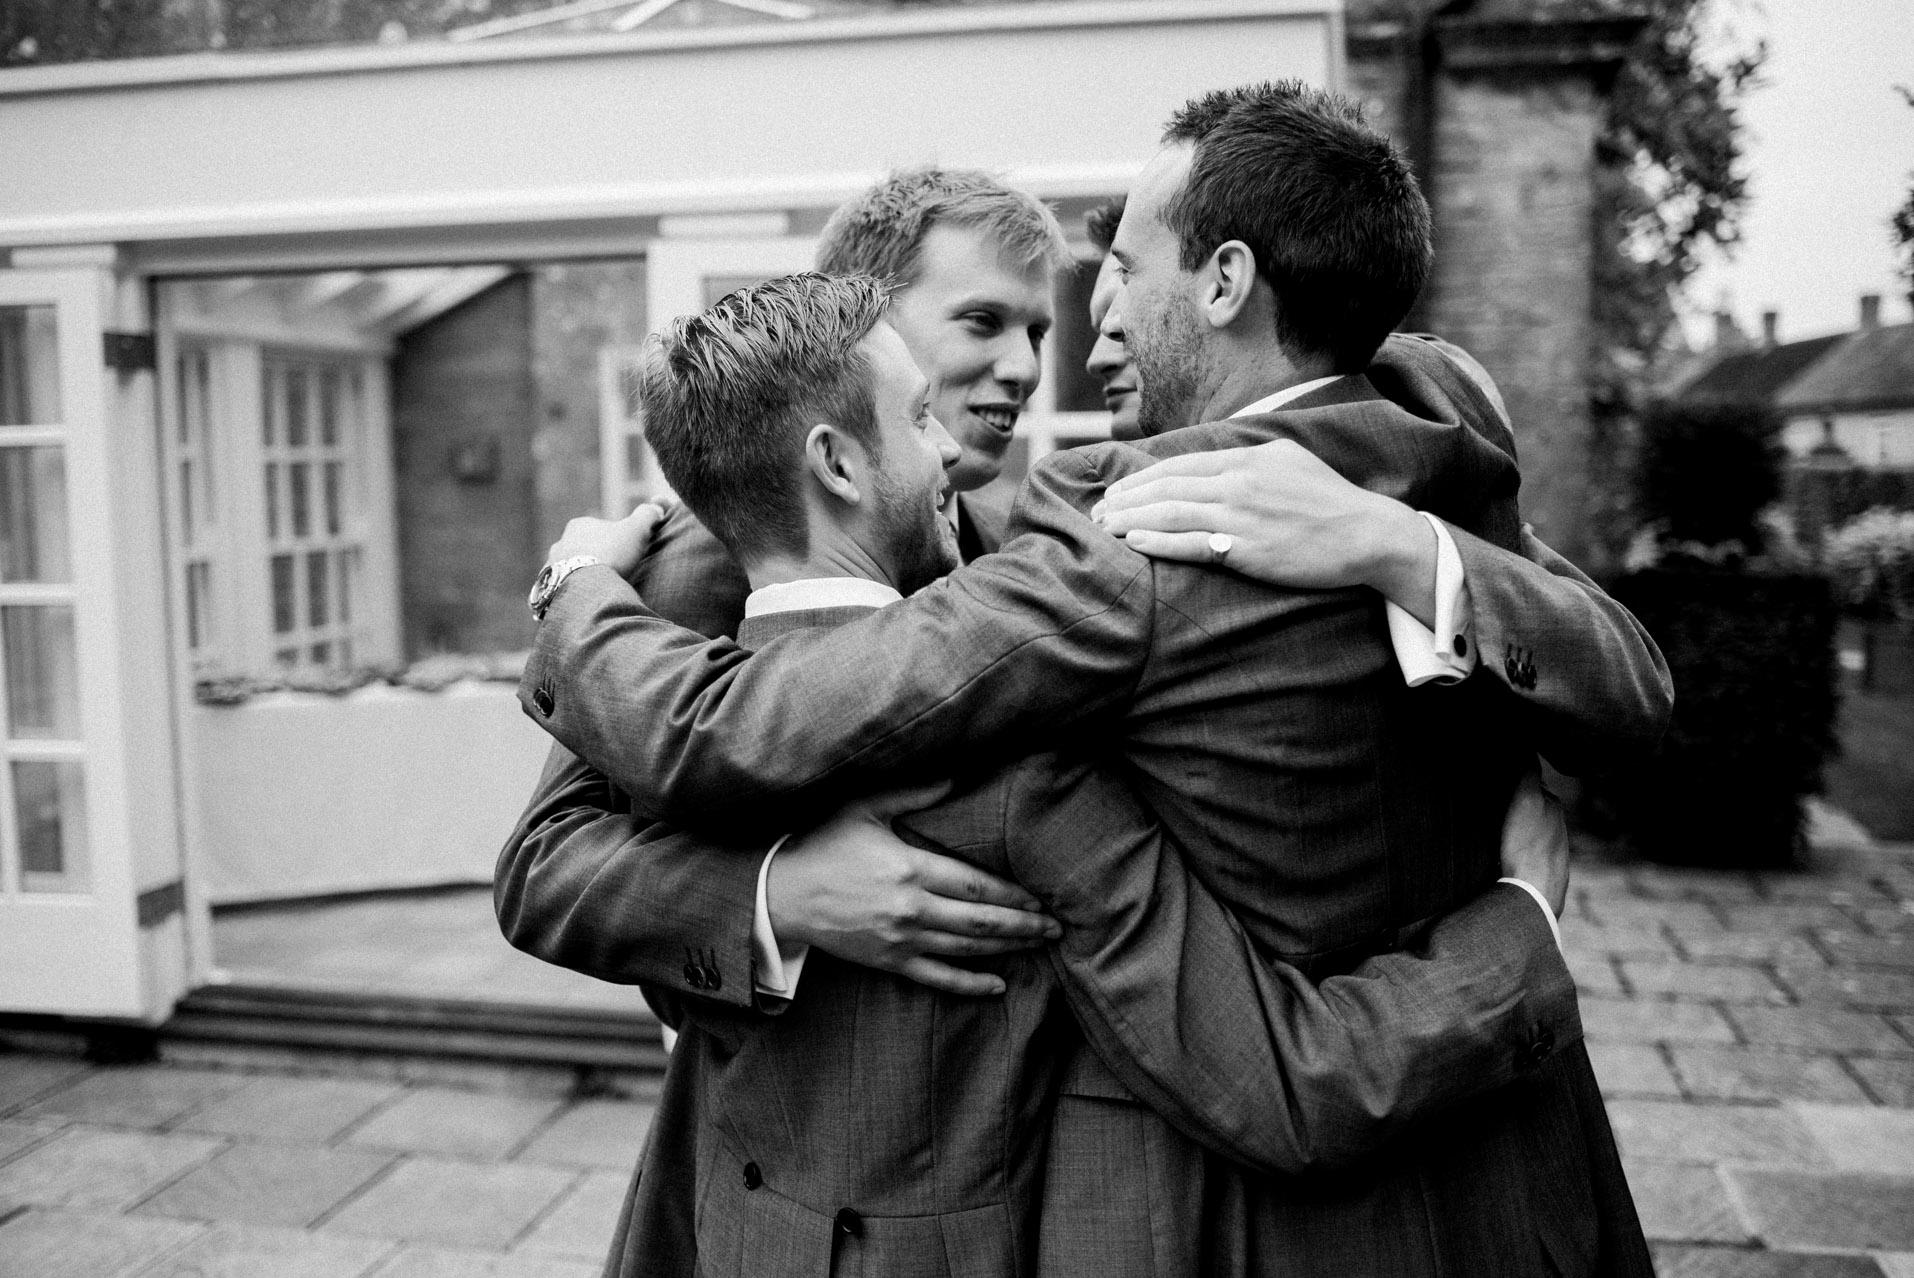 guys celebrating with hug